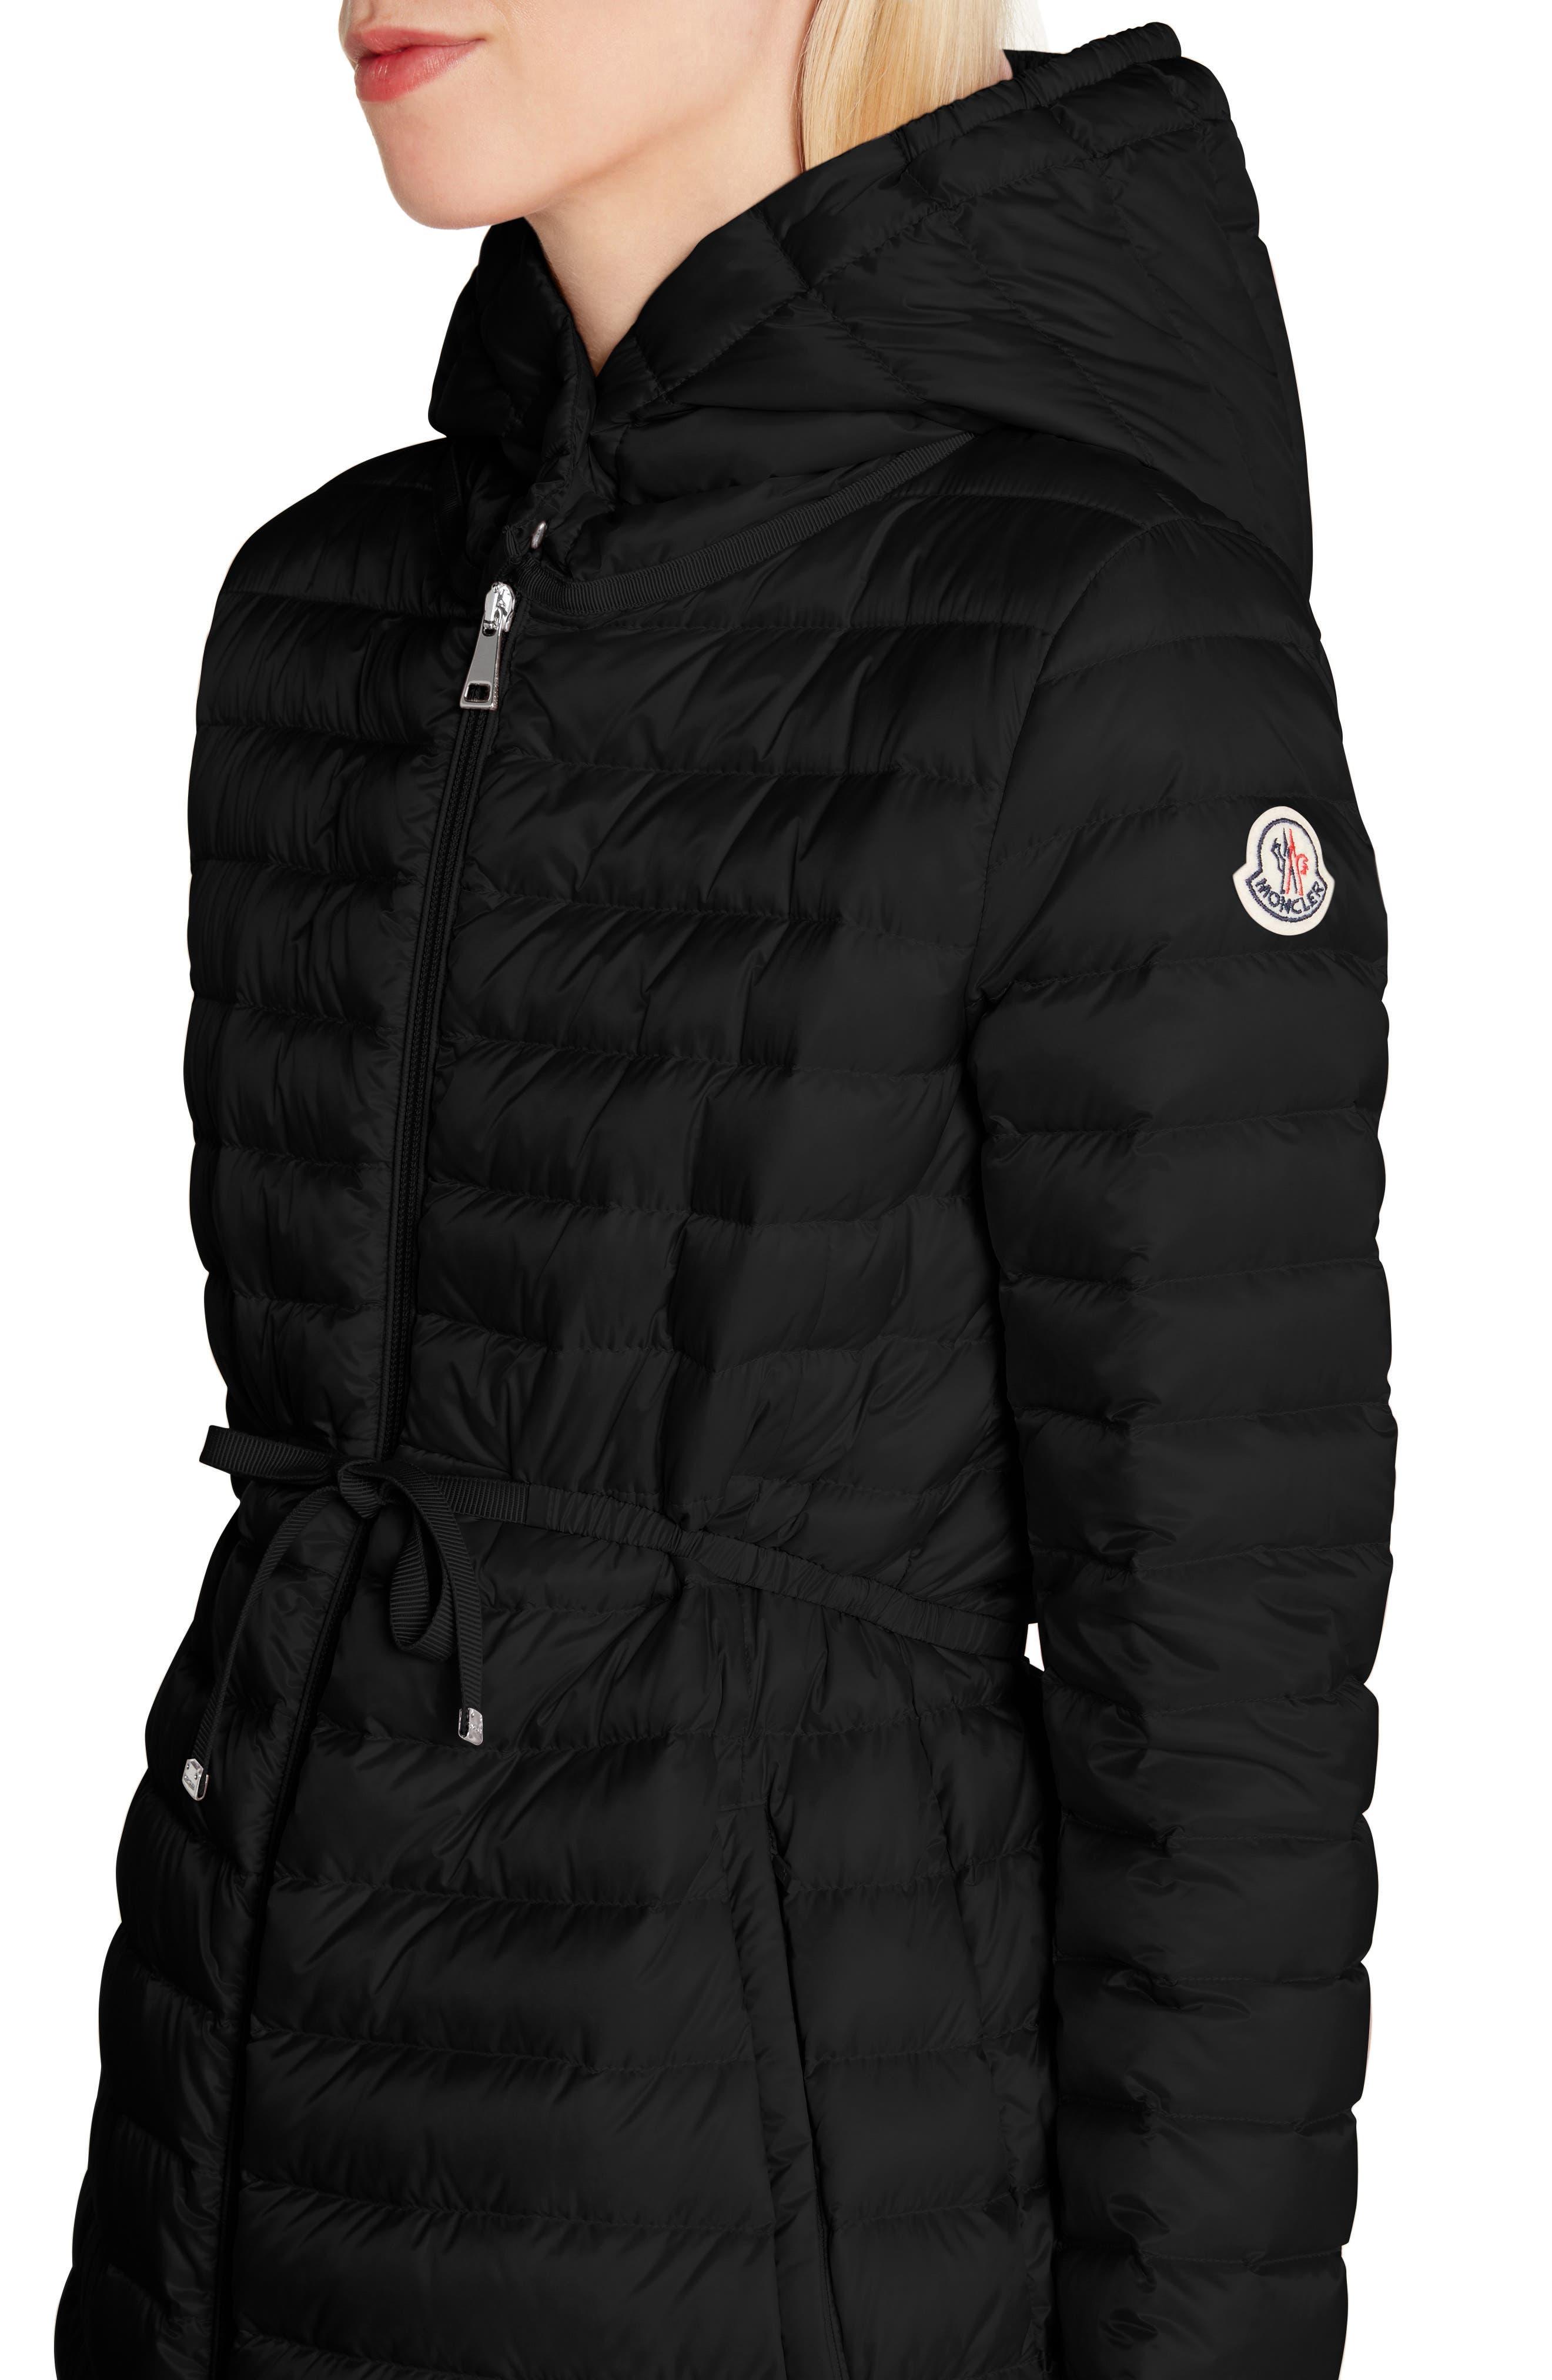 MONCLER,                             Barbel Water Resistant Long Hooded Down Jacket,                             Alternate thumbnail 4, color,                             001